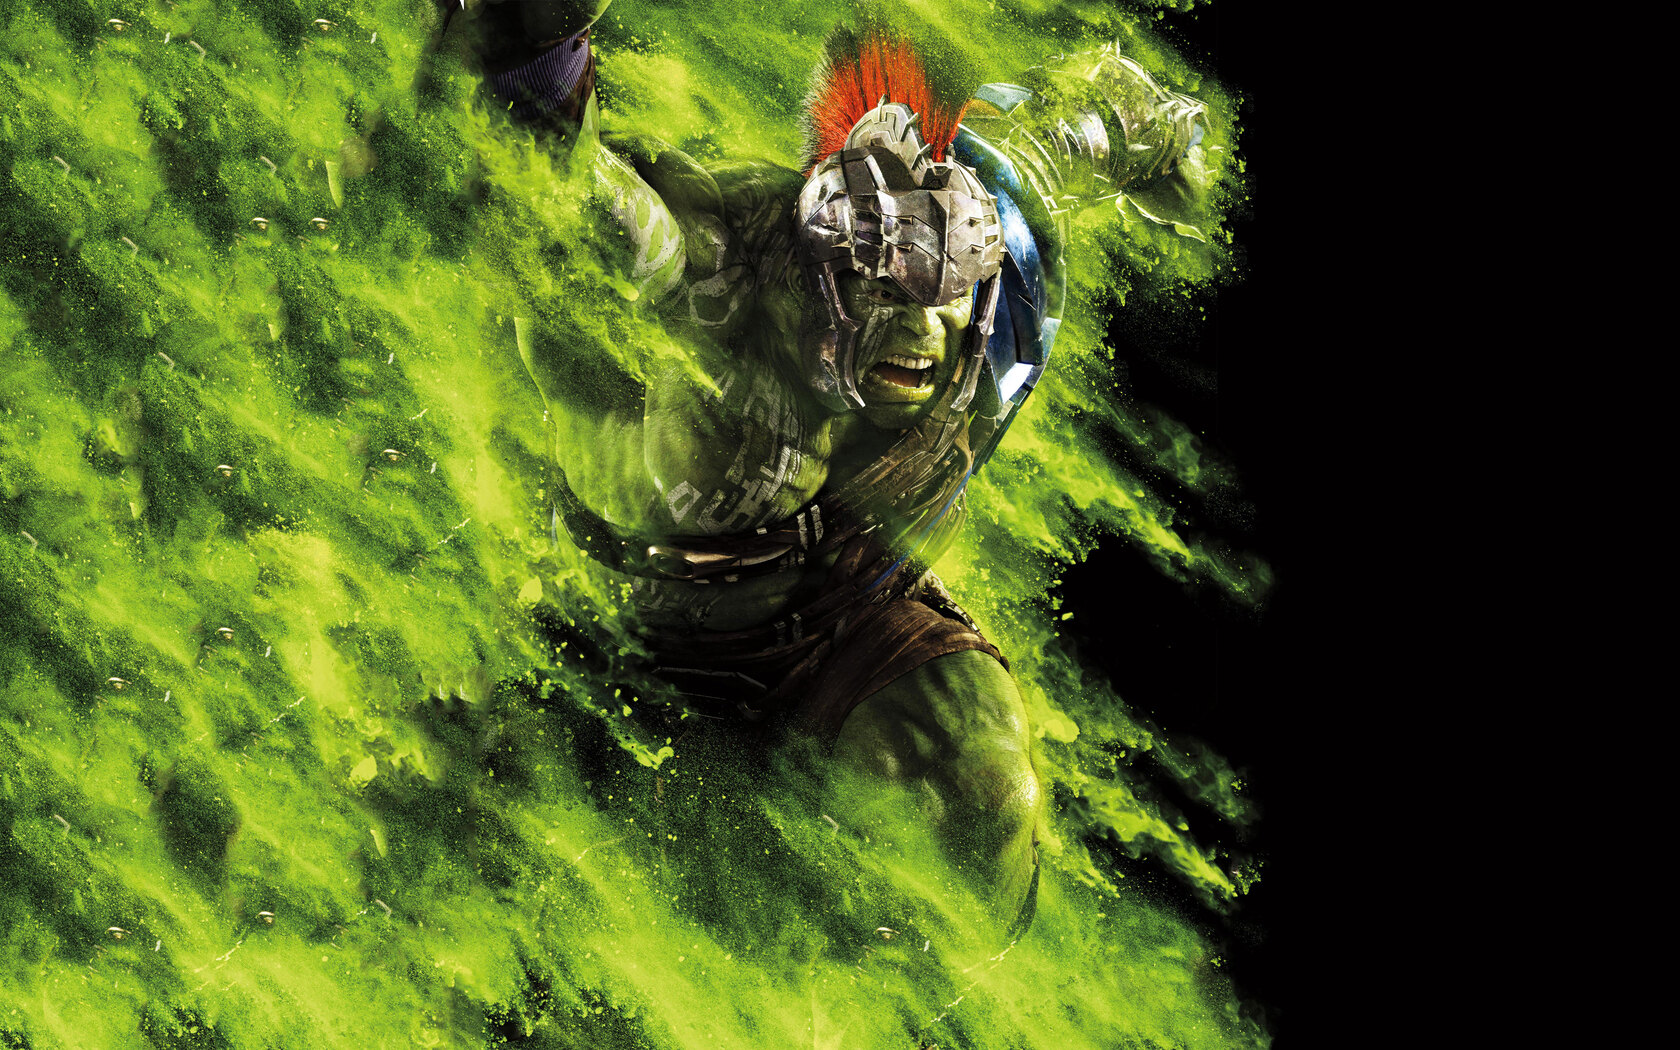 hulk-in-thor-ragnarok-5k-dv.jpg